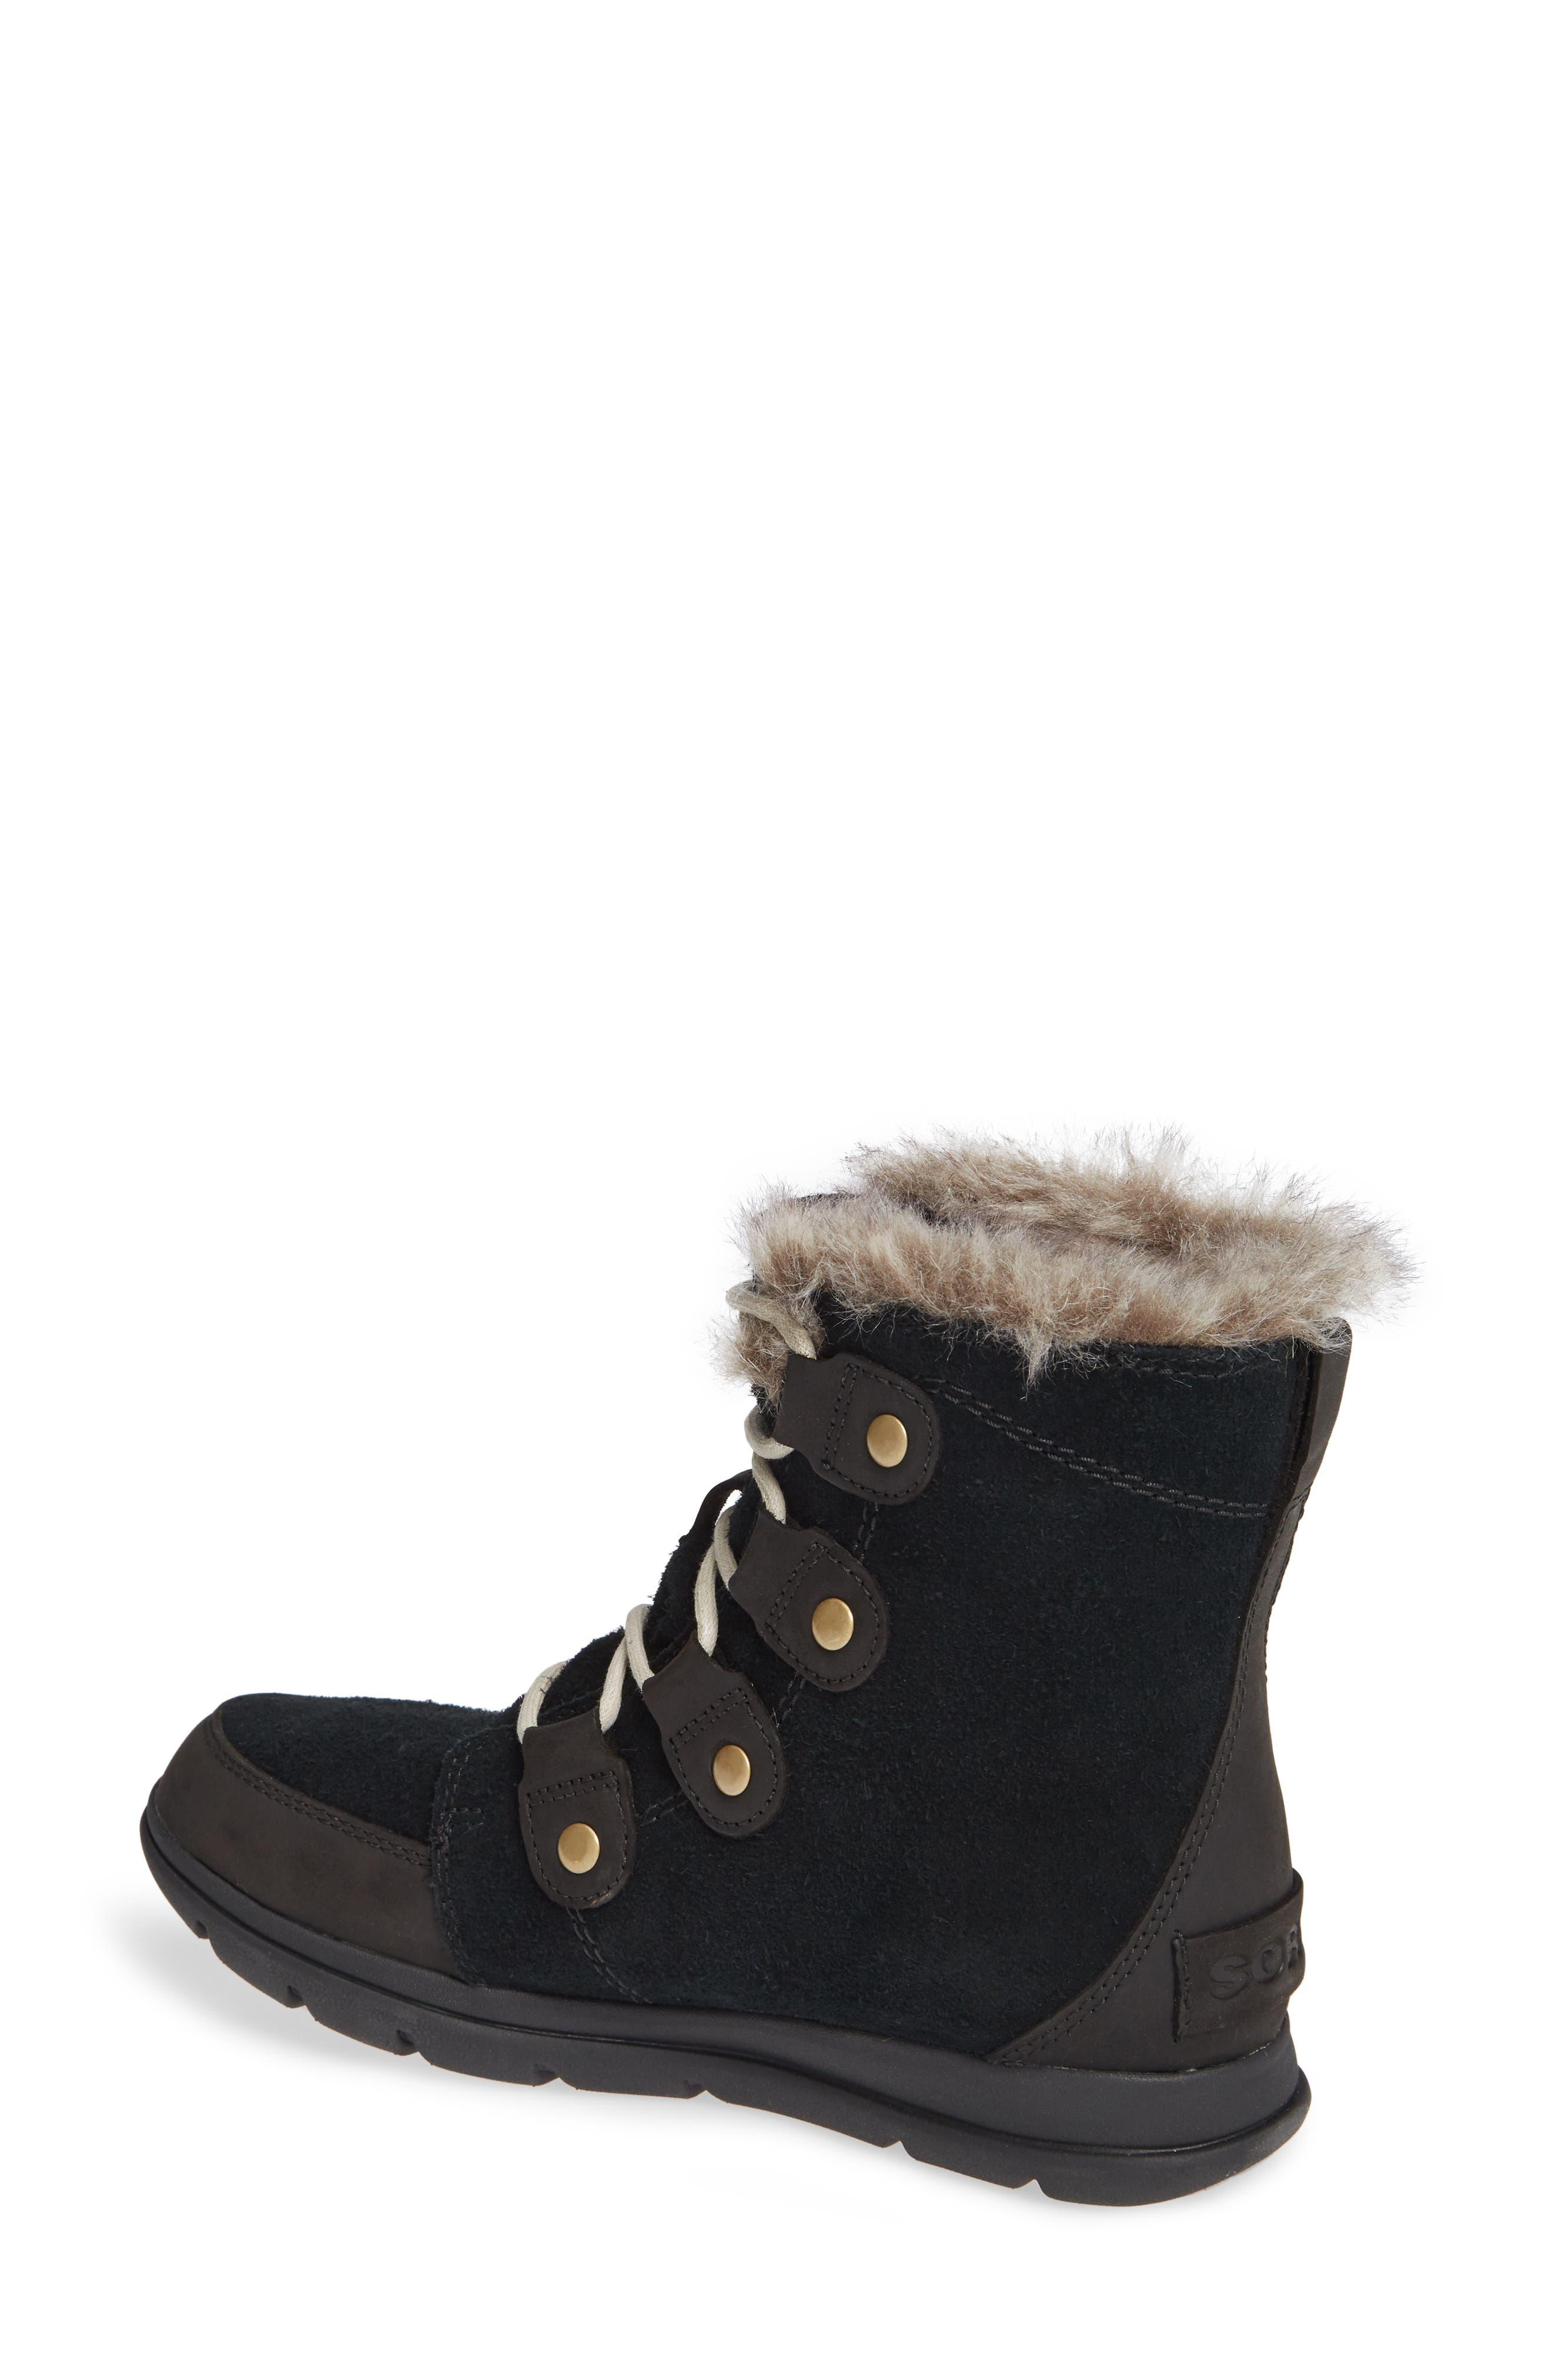 Explorer Joan Waterproof Boot with Faux Fur Collar,                             Alternate thumbnail 2, color,                             BLACK/ DARK STONE